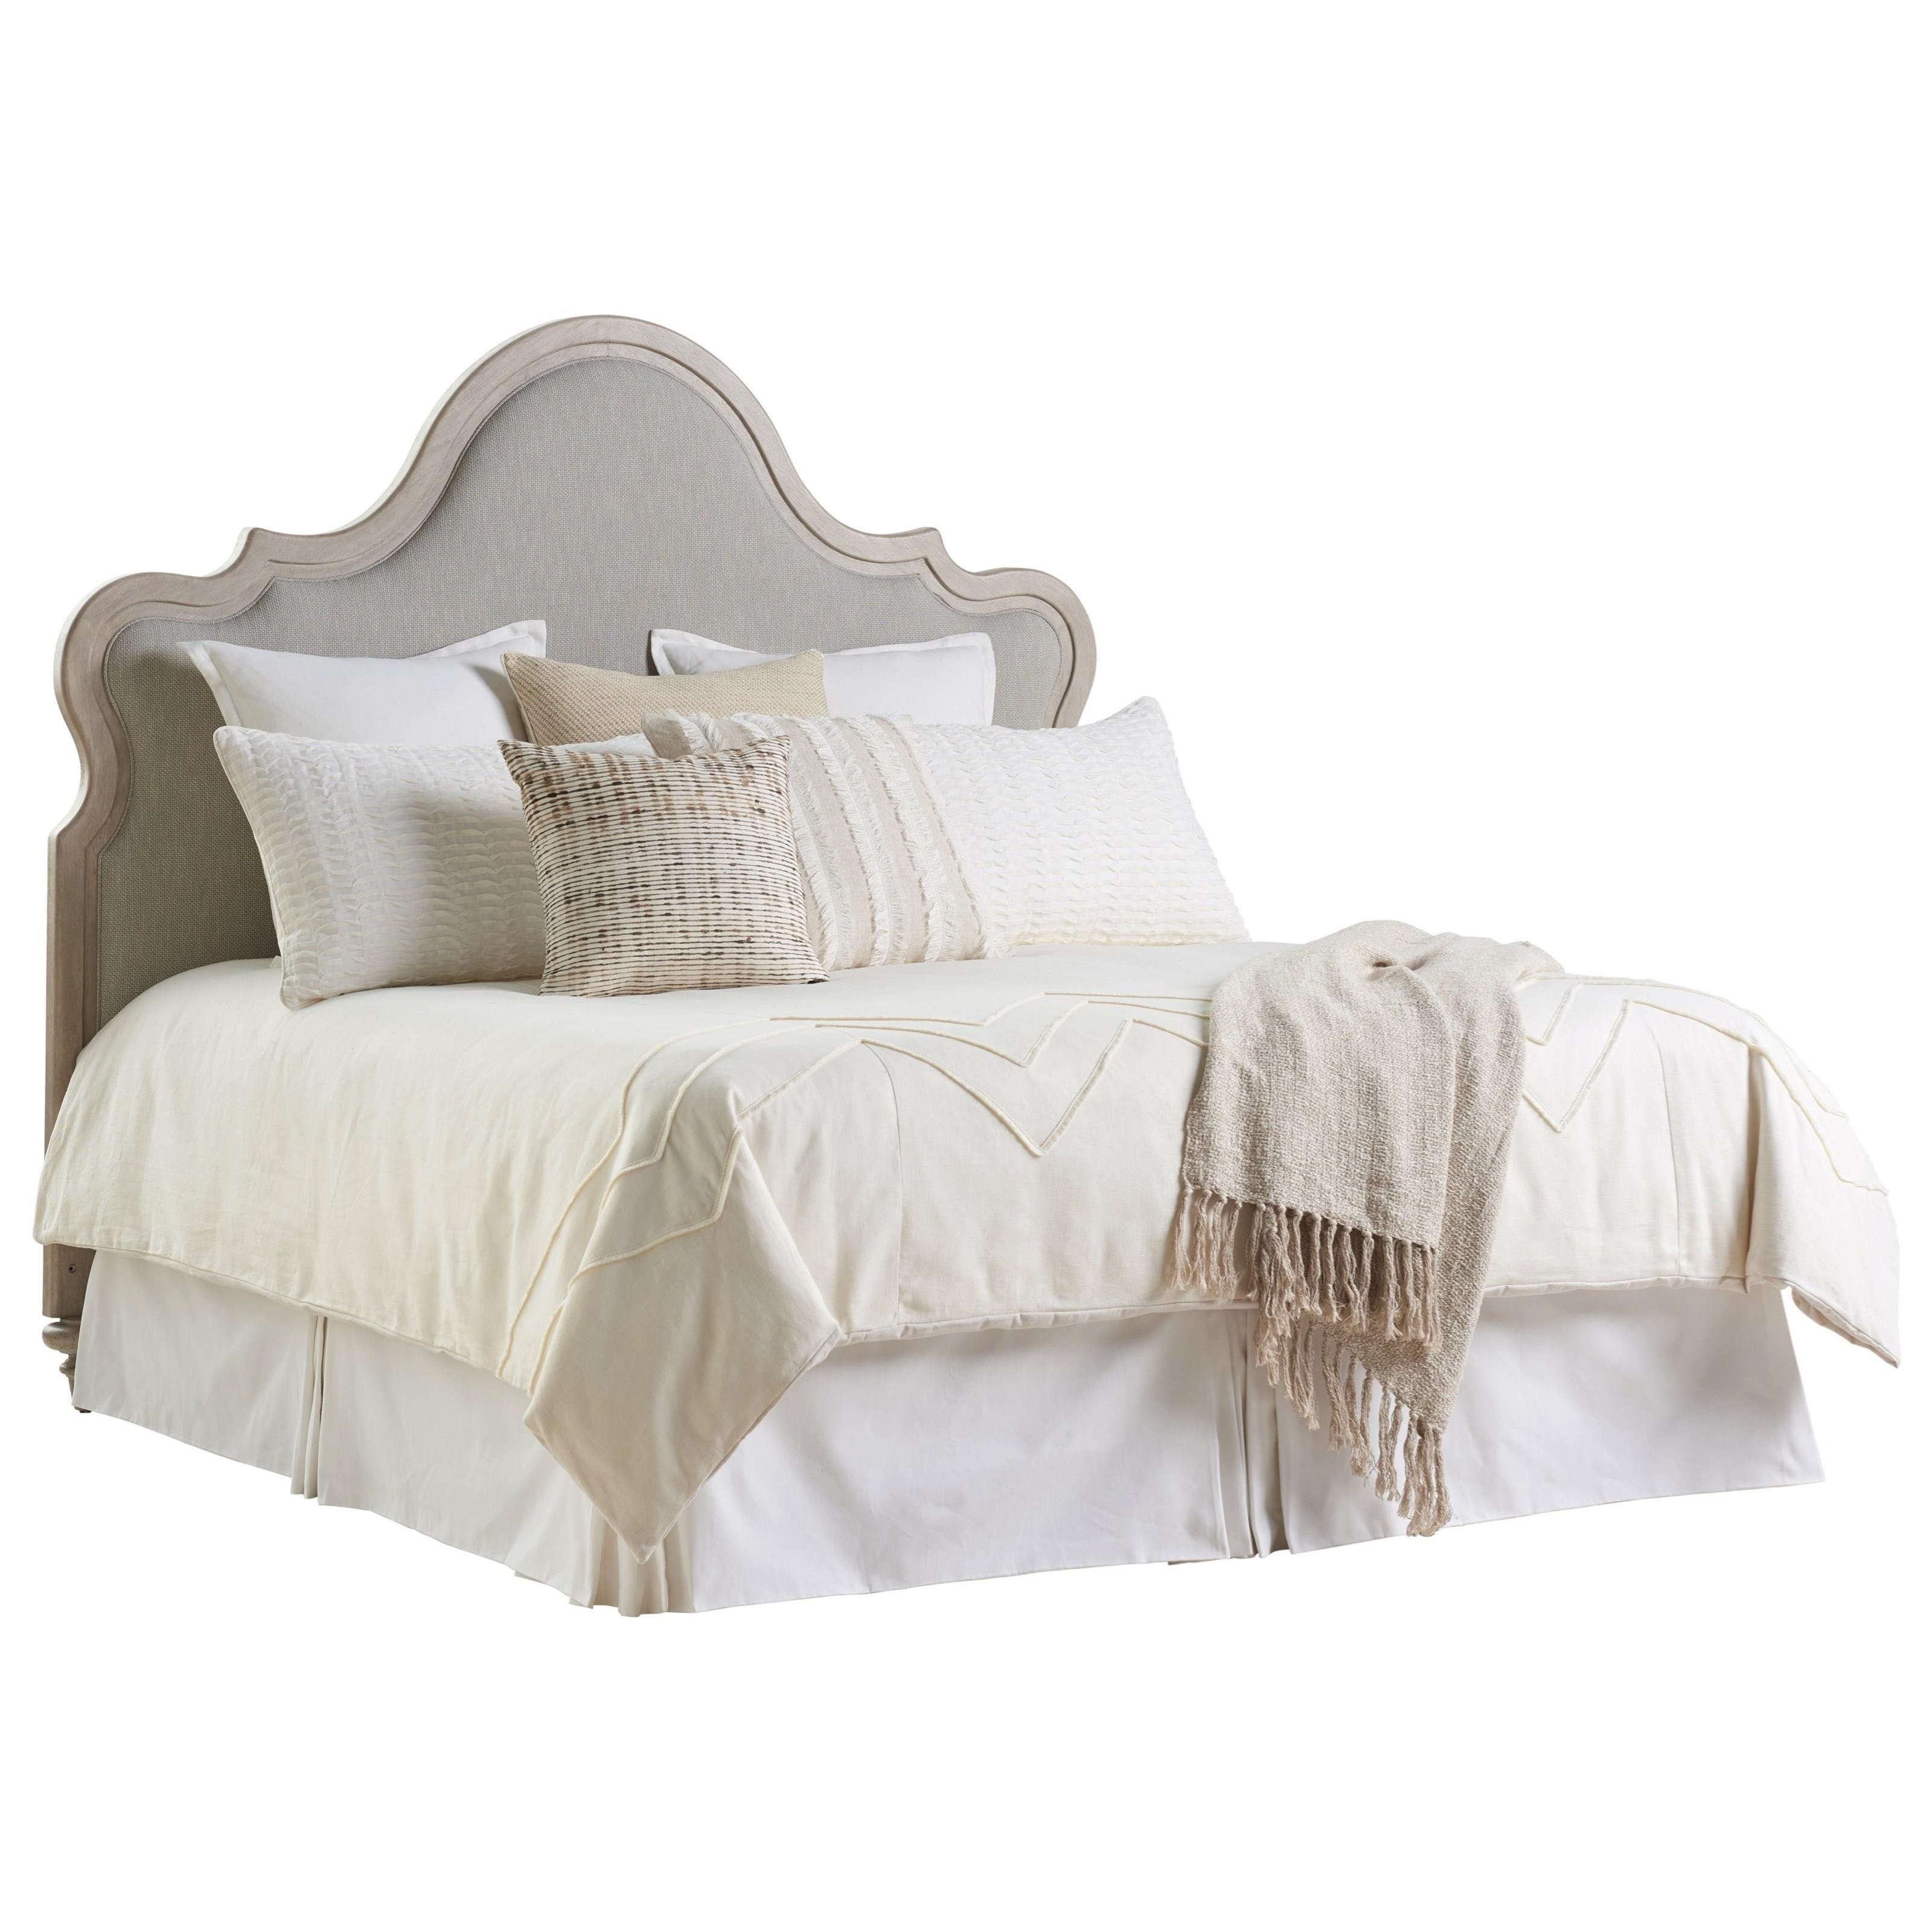 Malibu Zuma Upholstered Headboard King by Barclay Butera at Baer's Furniture